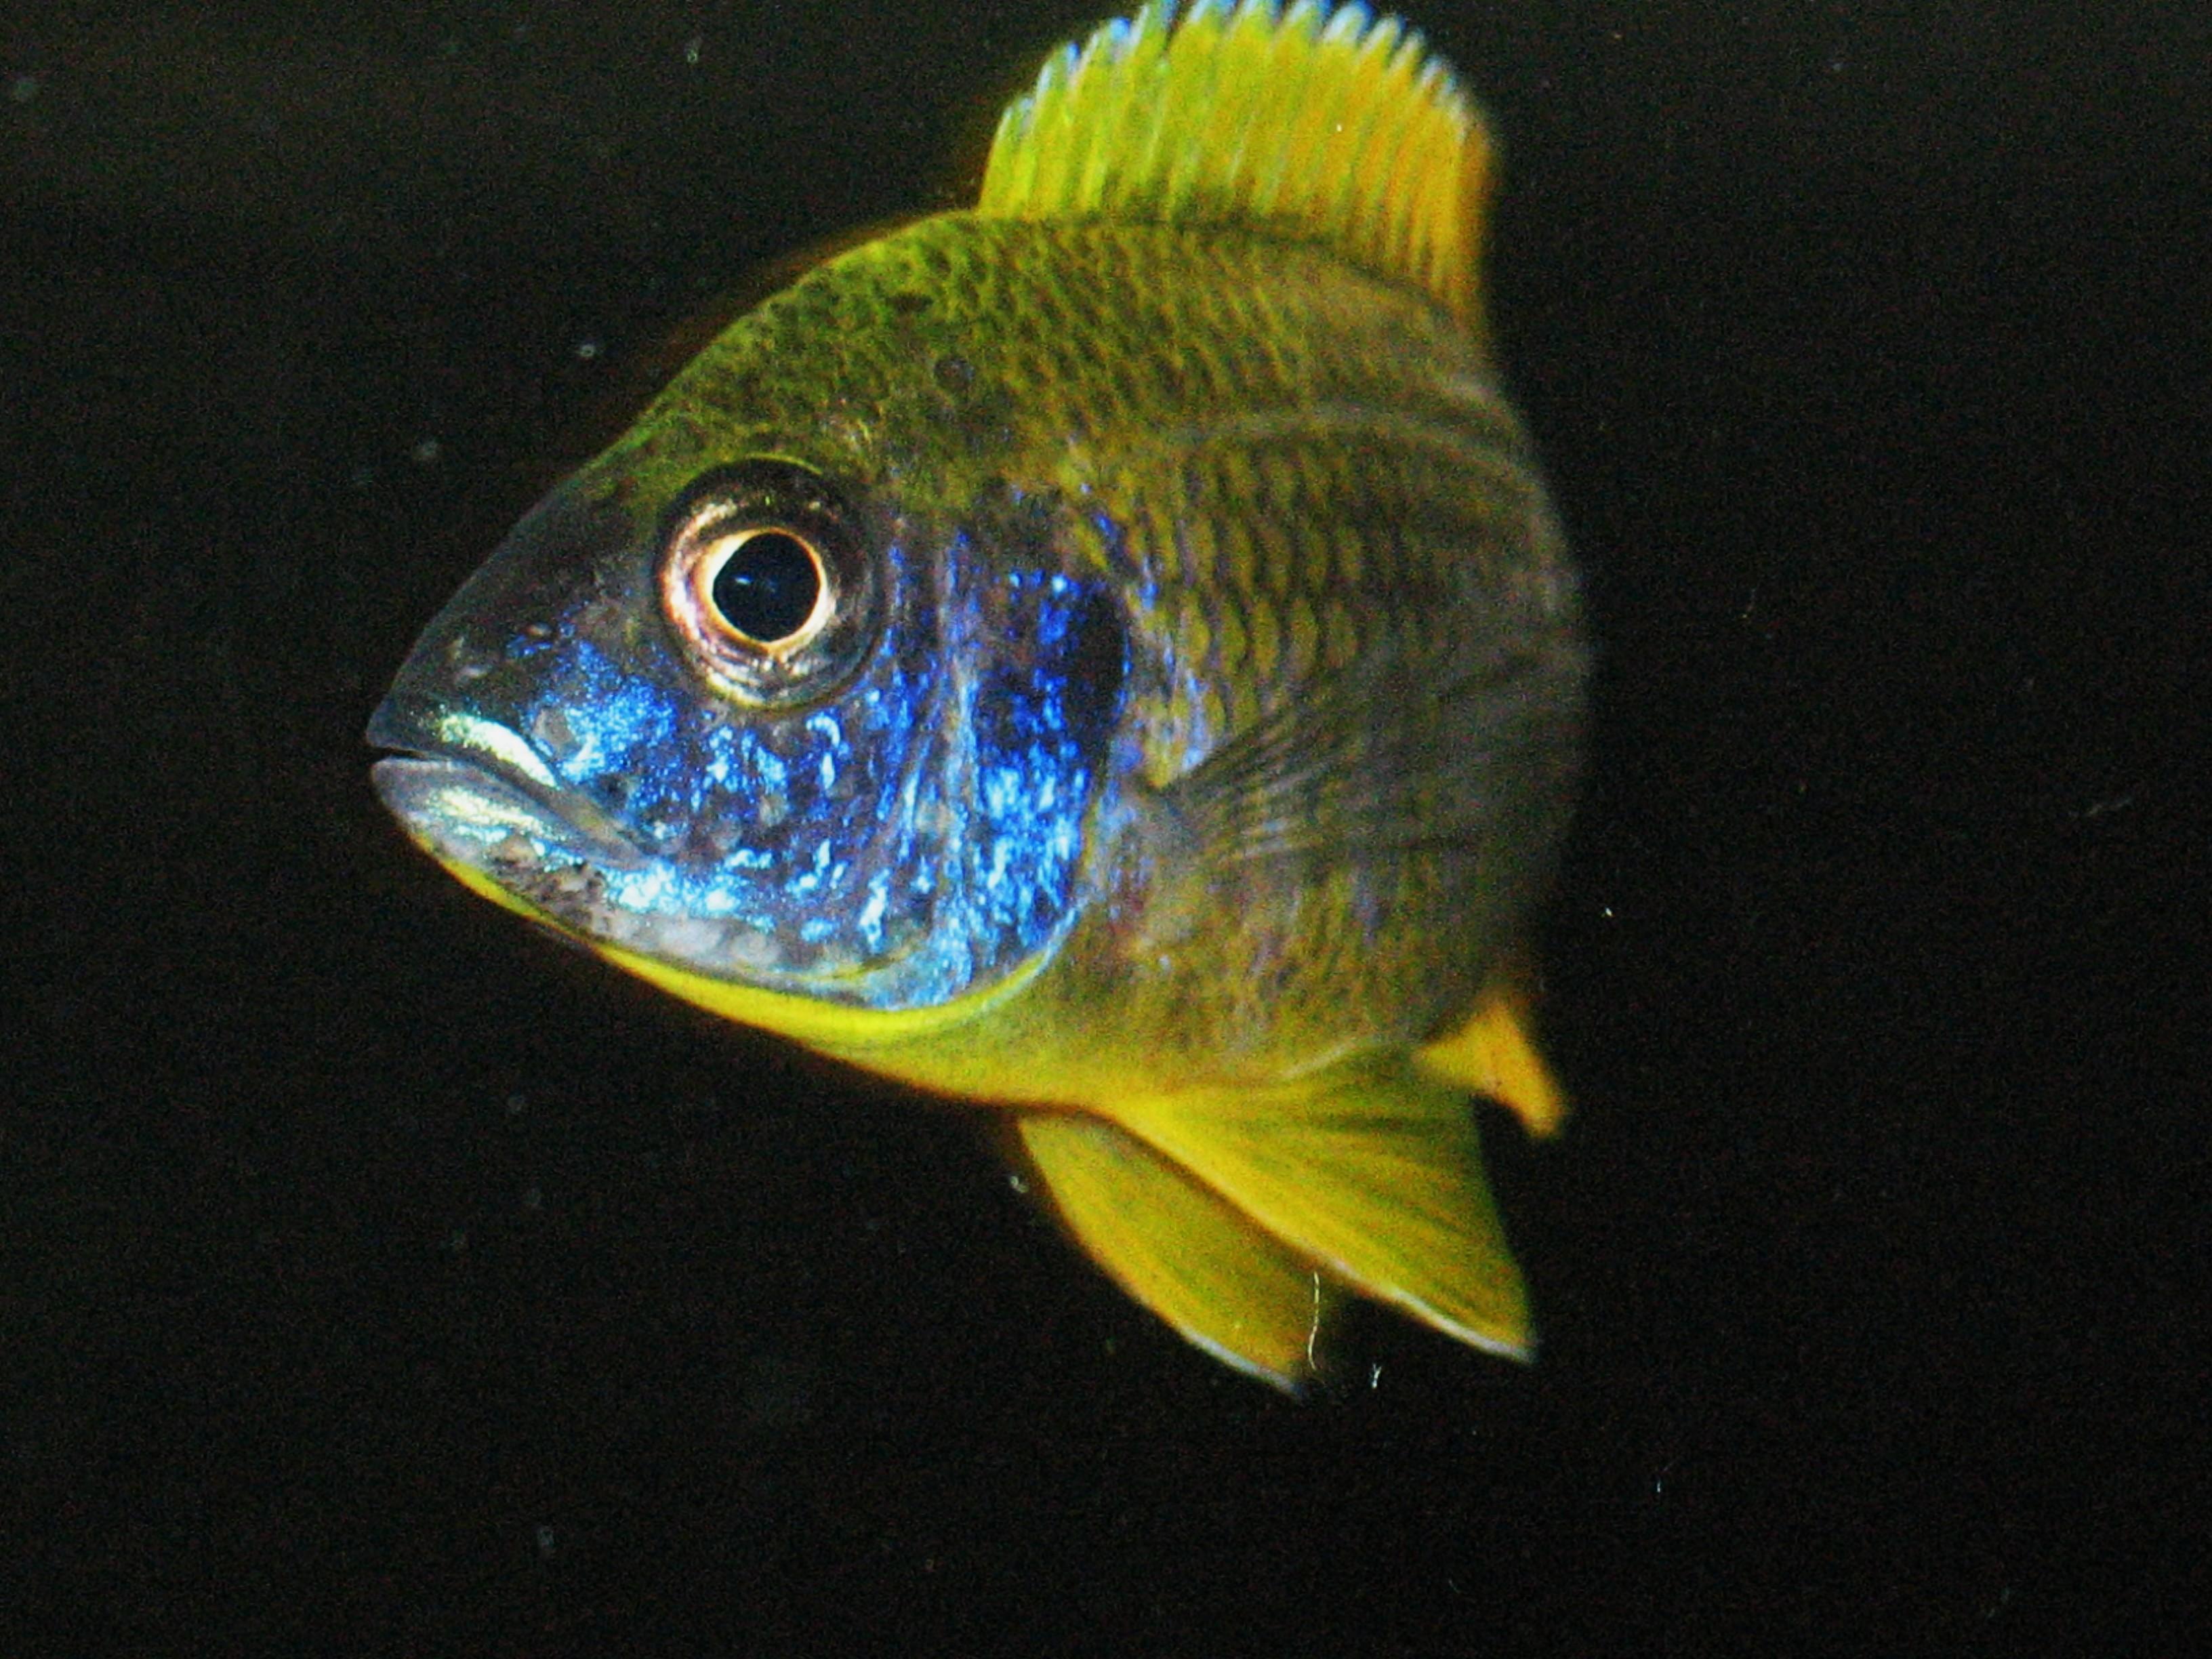 lemon jake peacock cichlid - photo #26